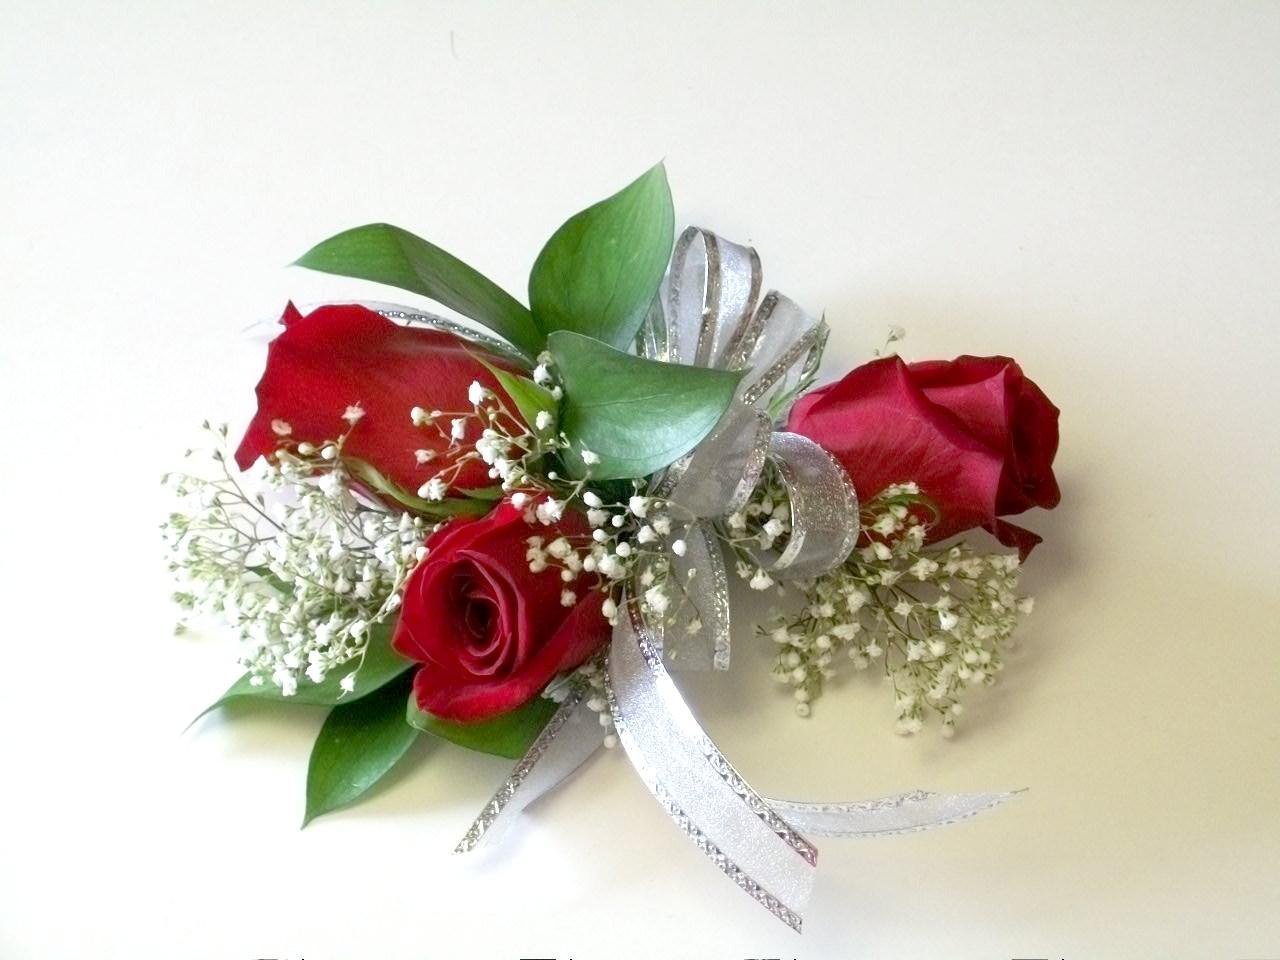 Suitable flower